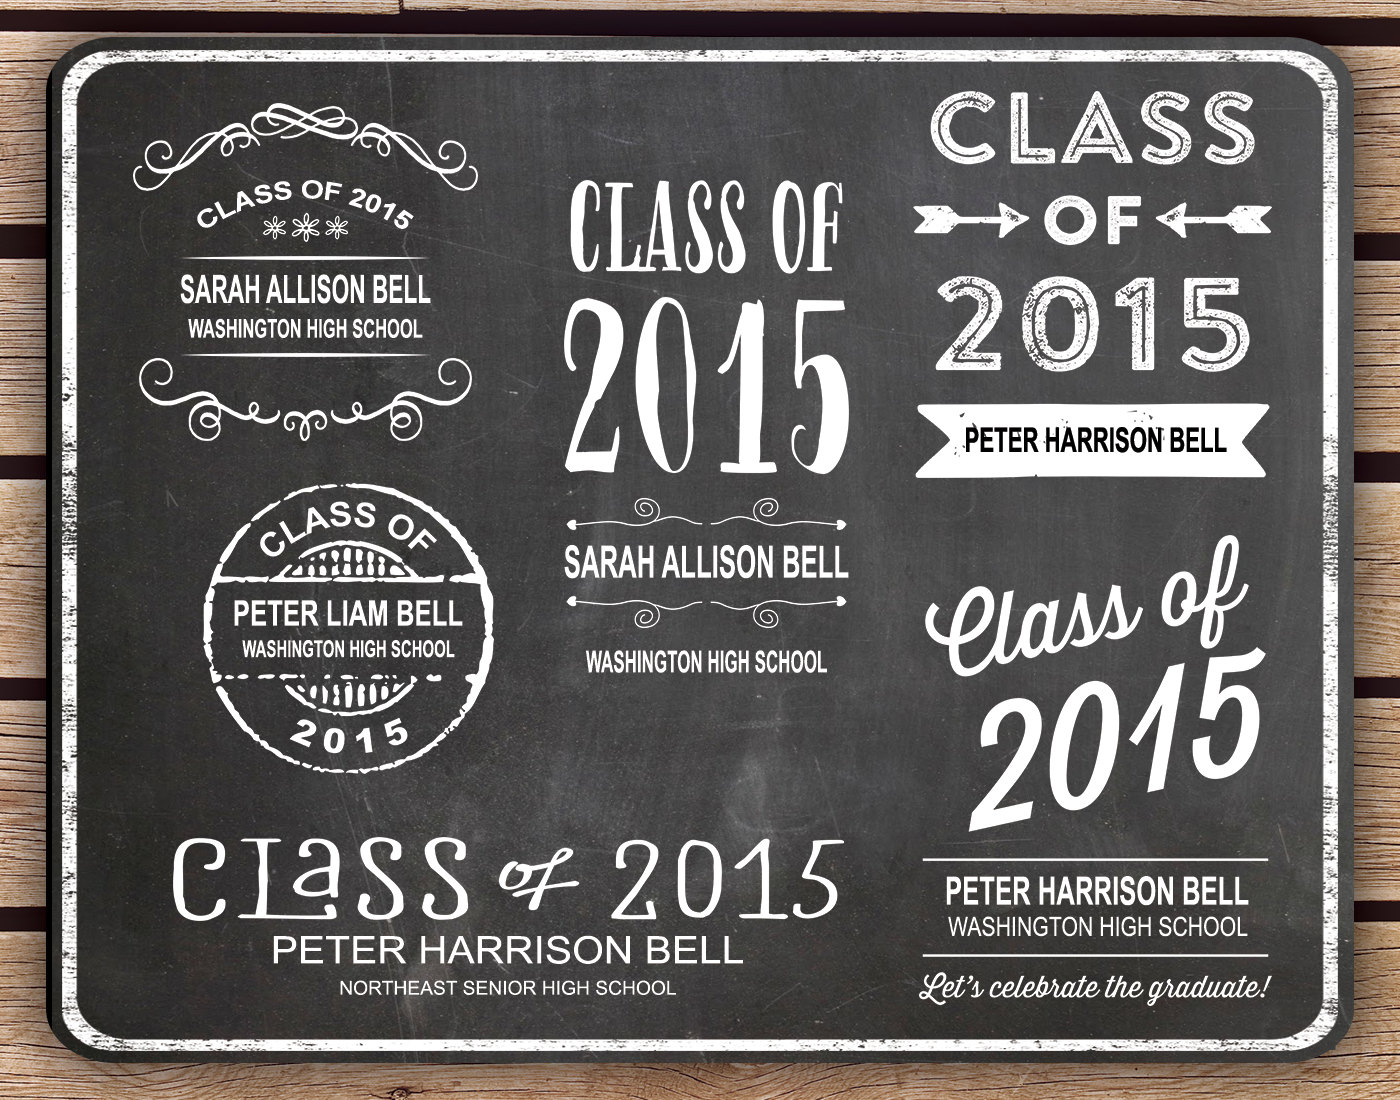 Chalk clipart graduation. Quotes nice pics ilfullxfulldcx